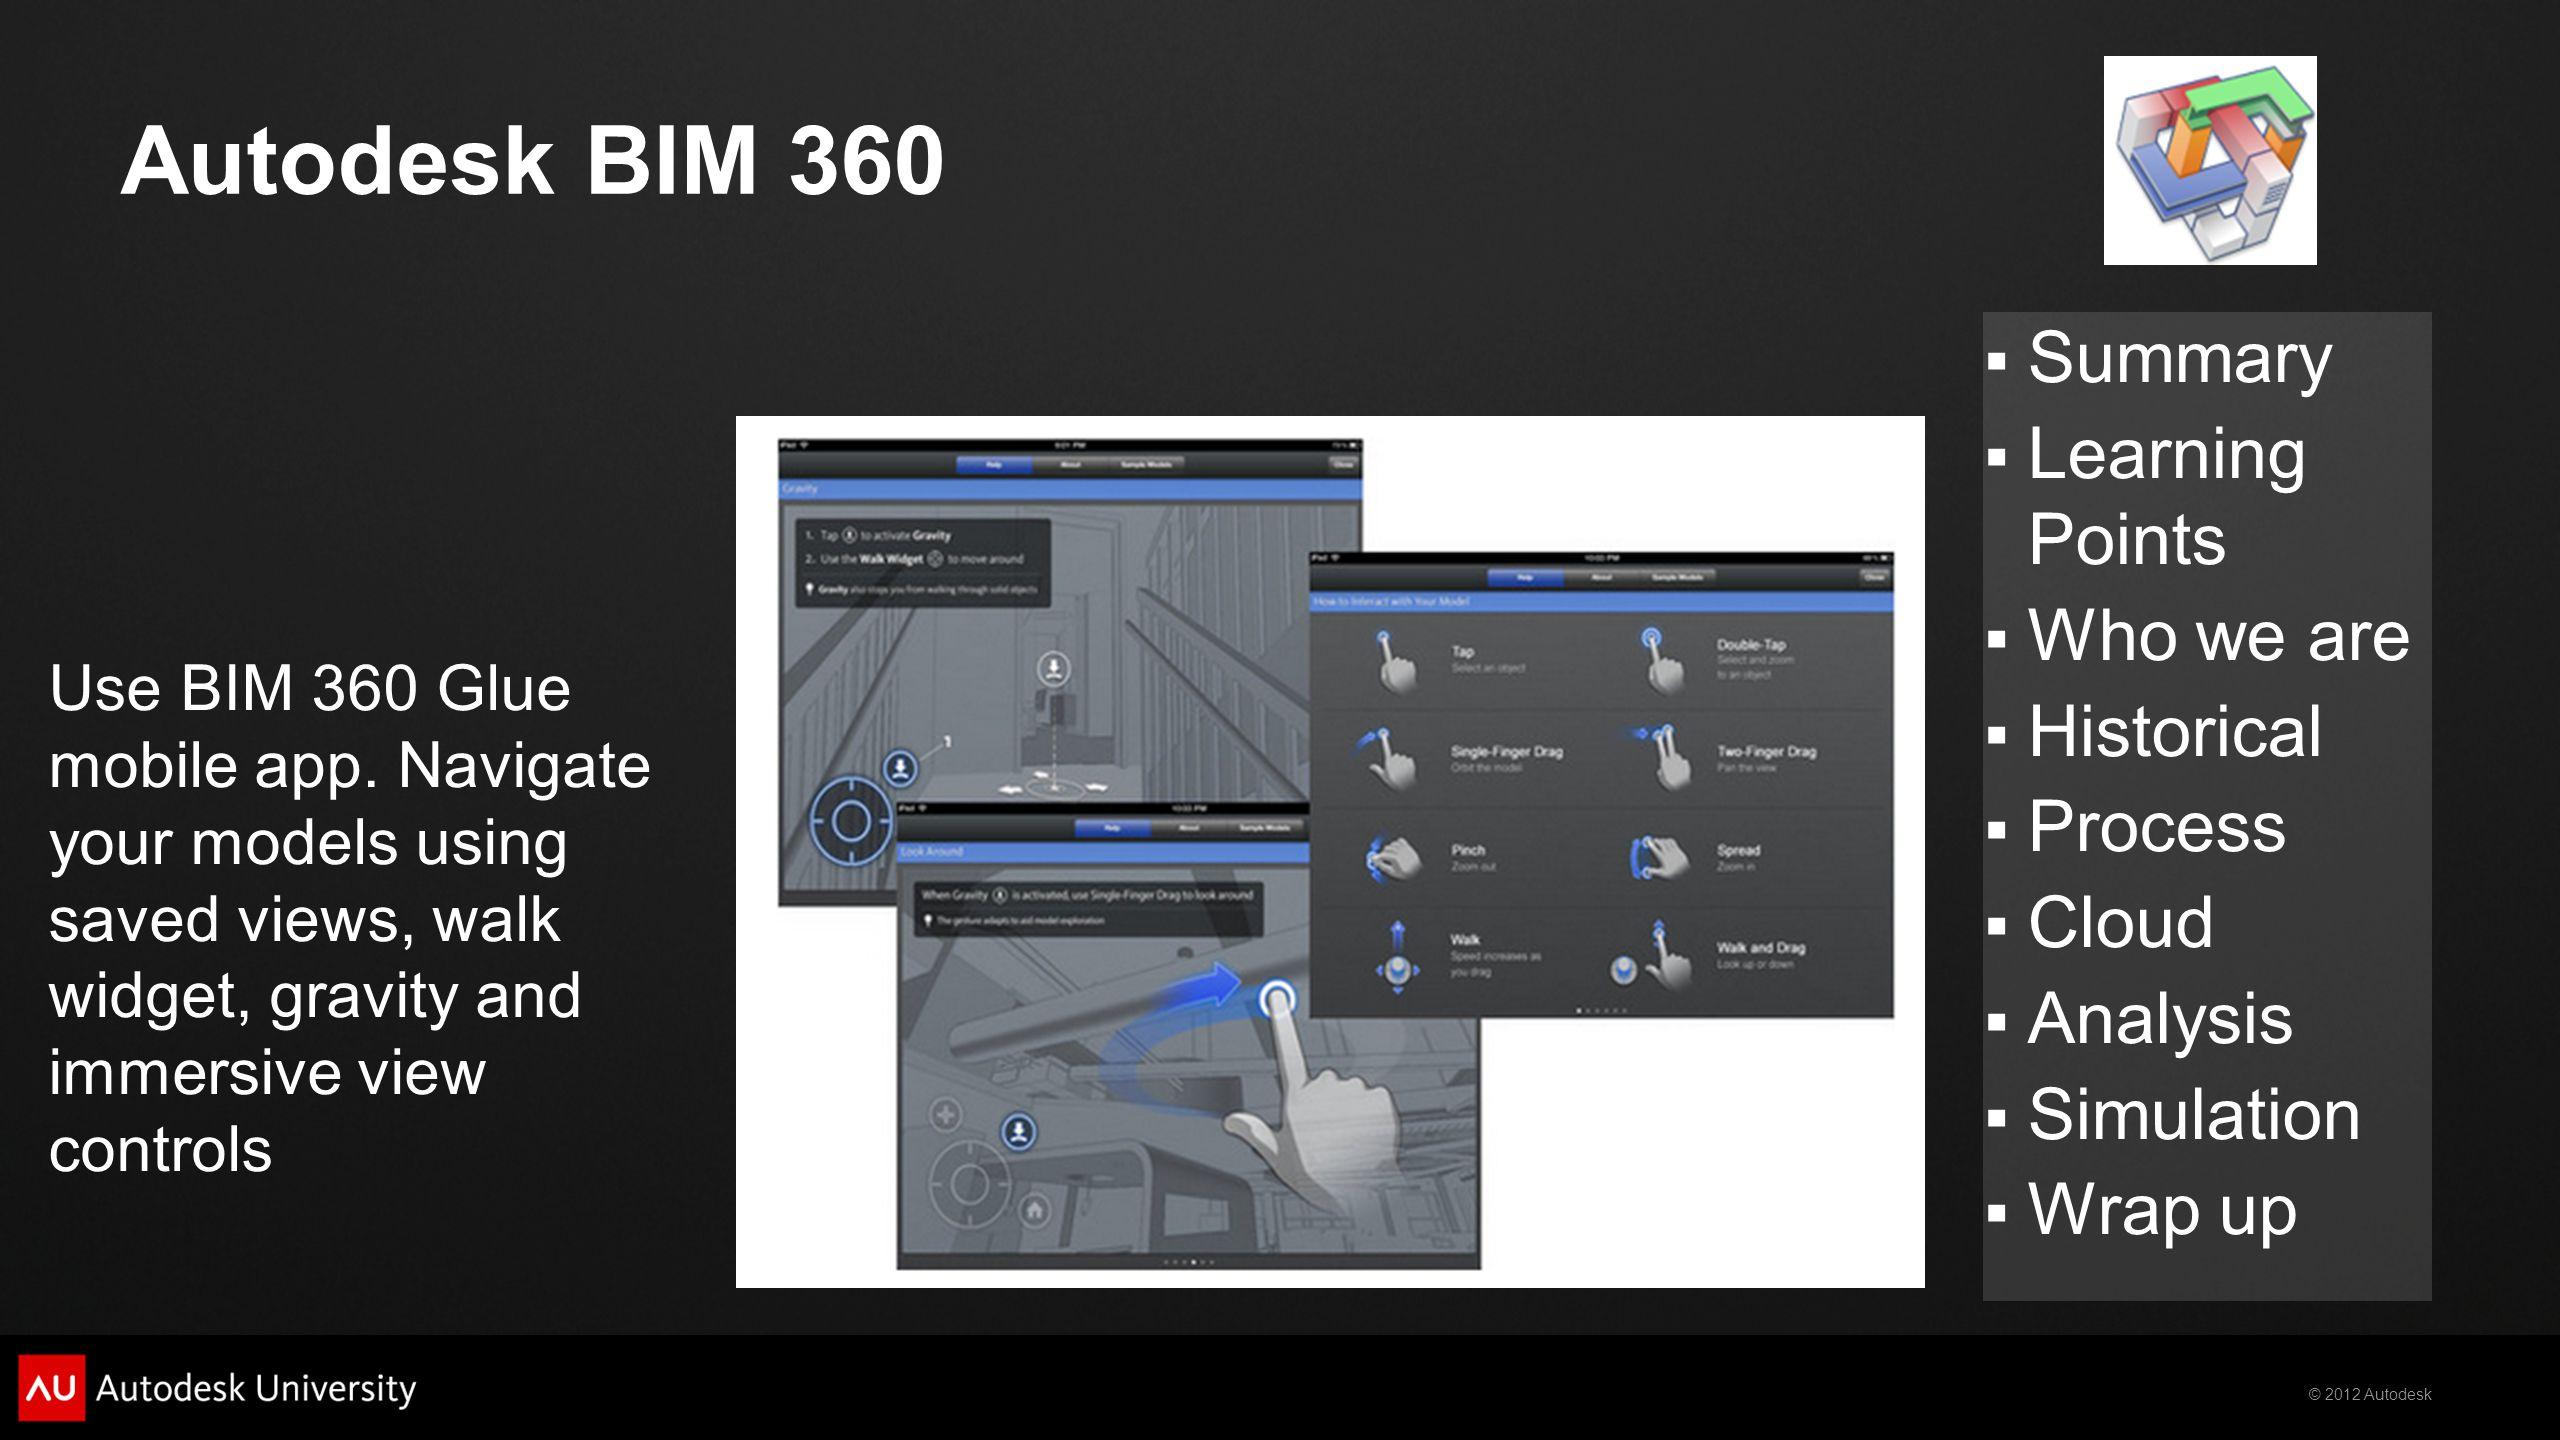 © 2012 Autodesk  Summary  Learning Points  Who we are  Historical  Process  Cloud  Analysis  Simulation  Wrap up Autodesk BIM 360 Use BIM 360 Glue mobile app.